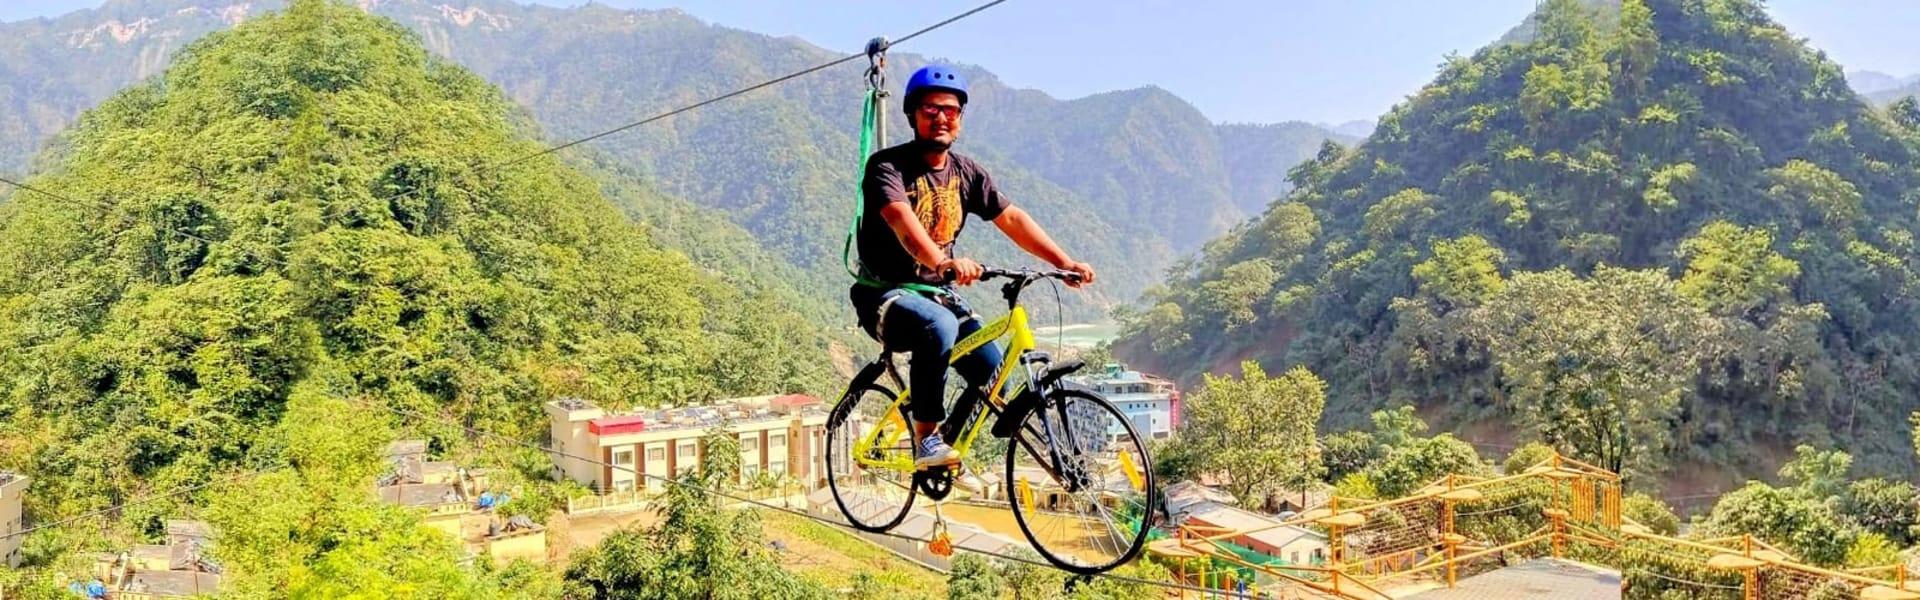 Sky Cycling in Rishikesh Image